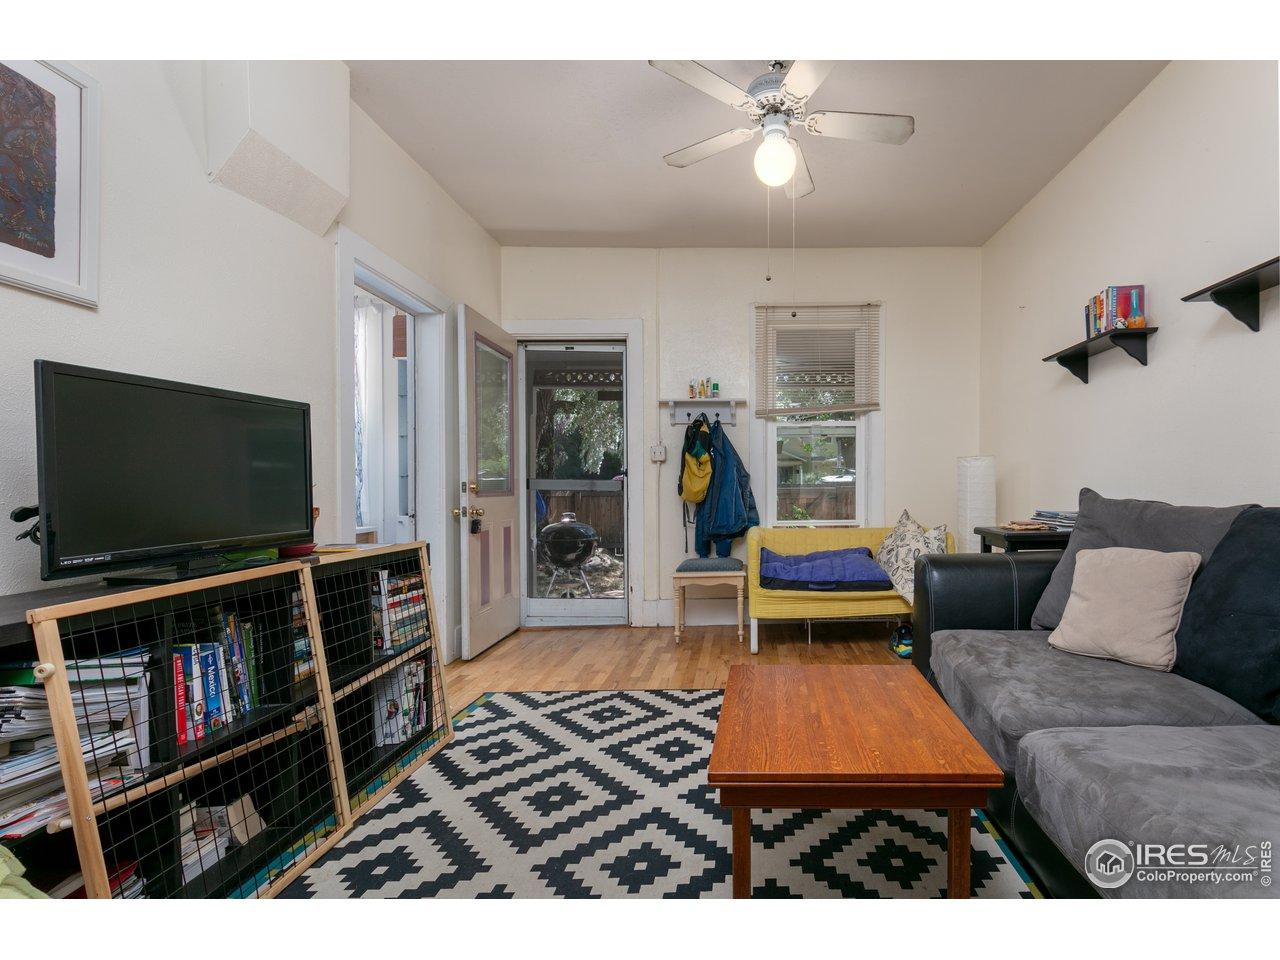 Unit 2 Living Room